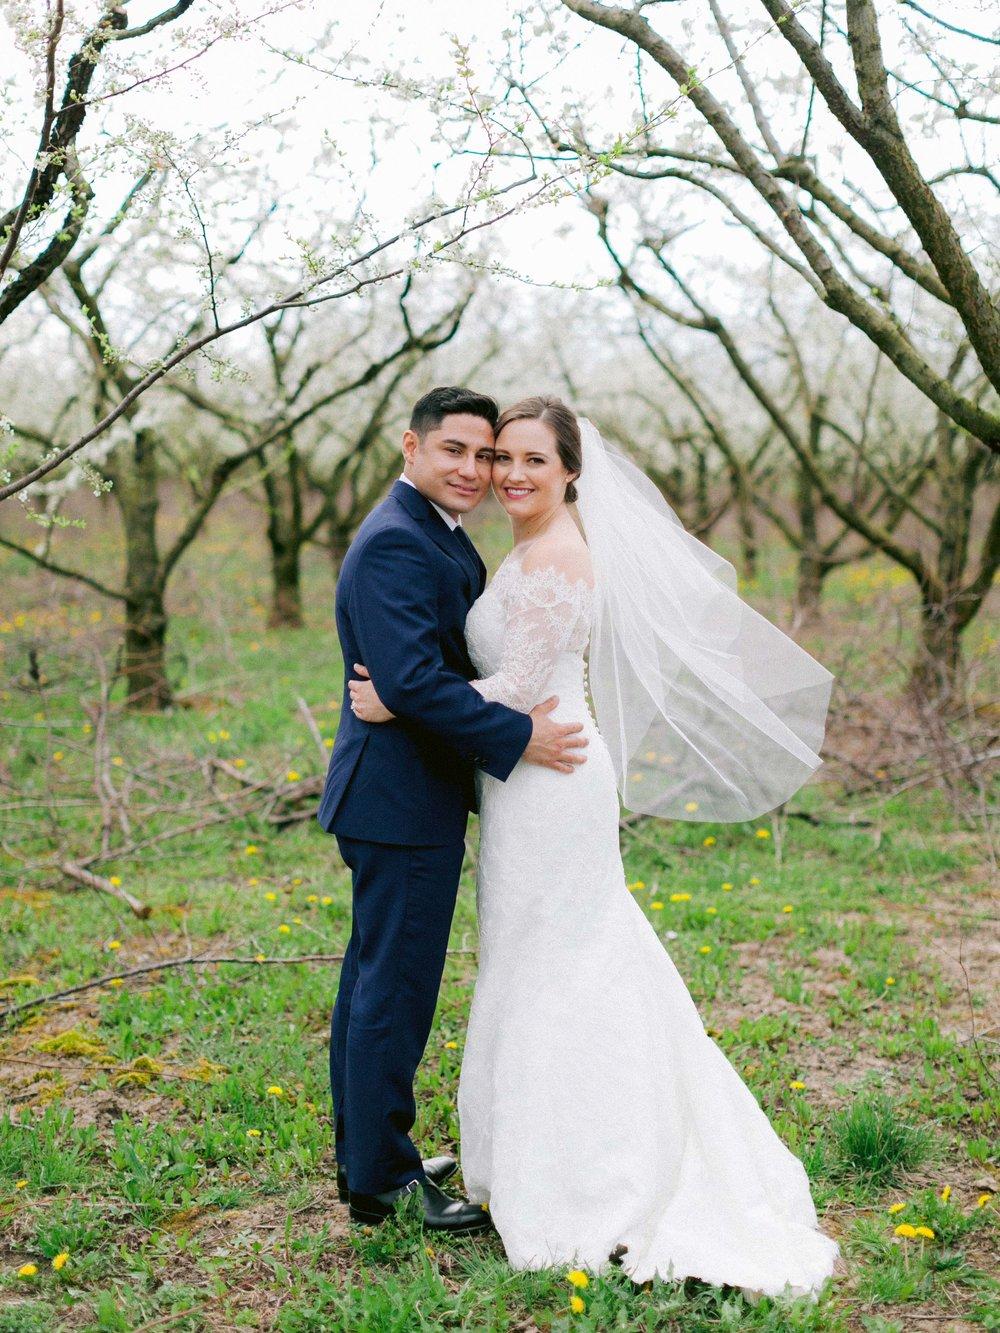 Niagara_on_the_lake_spring_wedding_kurtz_orpia_toronto_Vineyard_wedding_fine_art (61 of 92).jpg